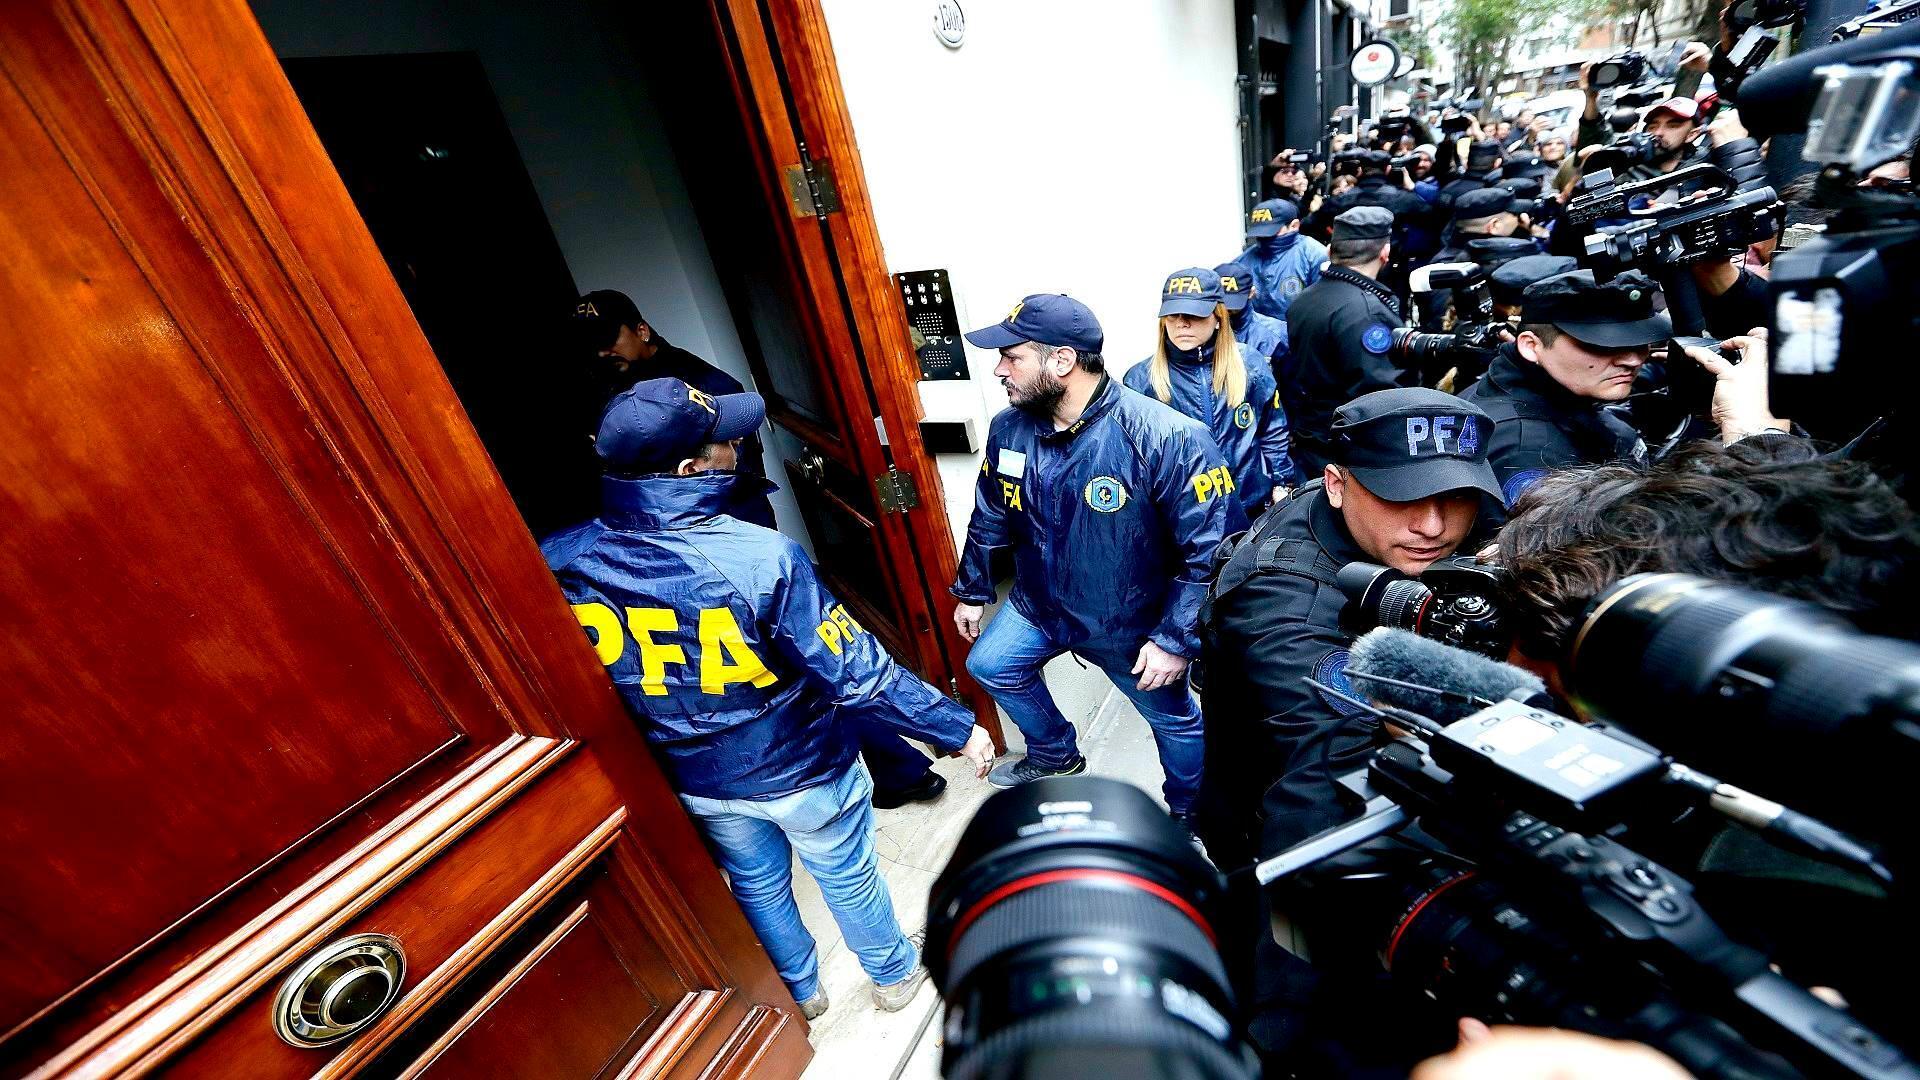 Argentina corruption: seizing assets difficult even under Macri